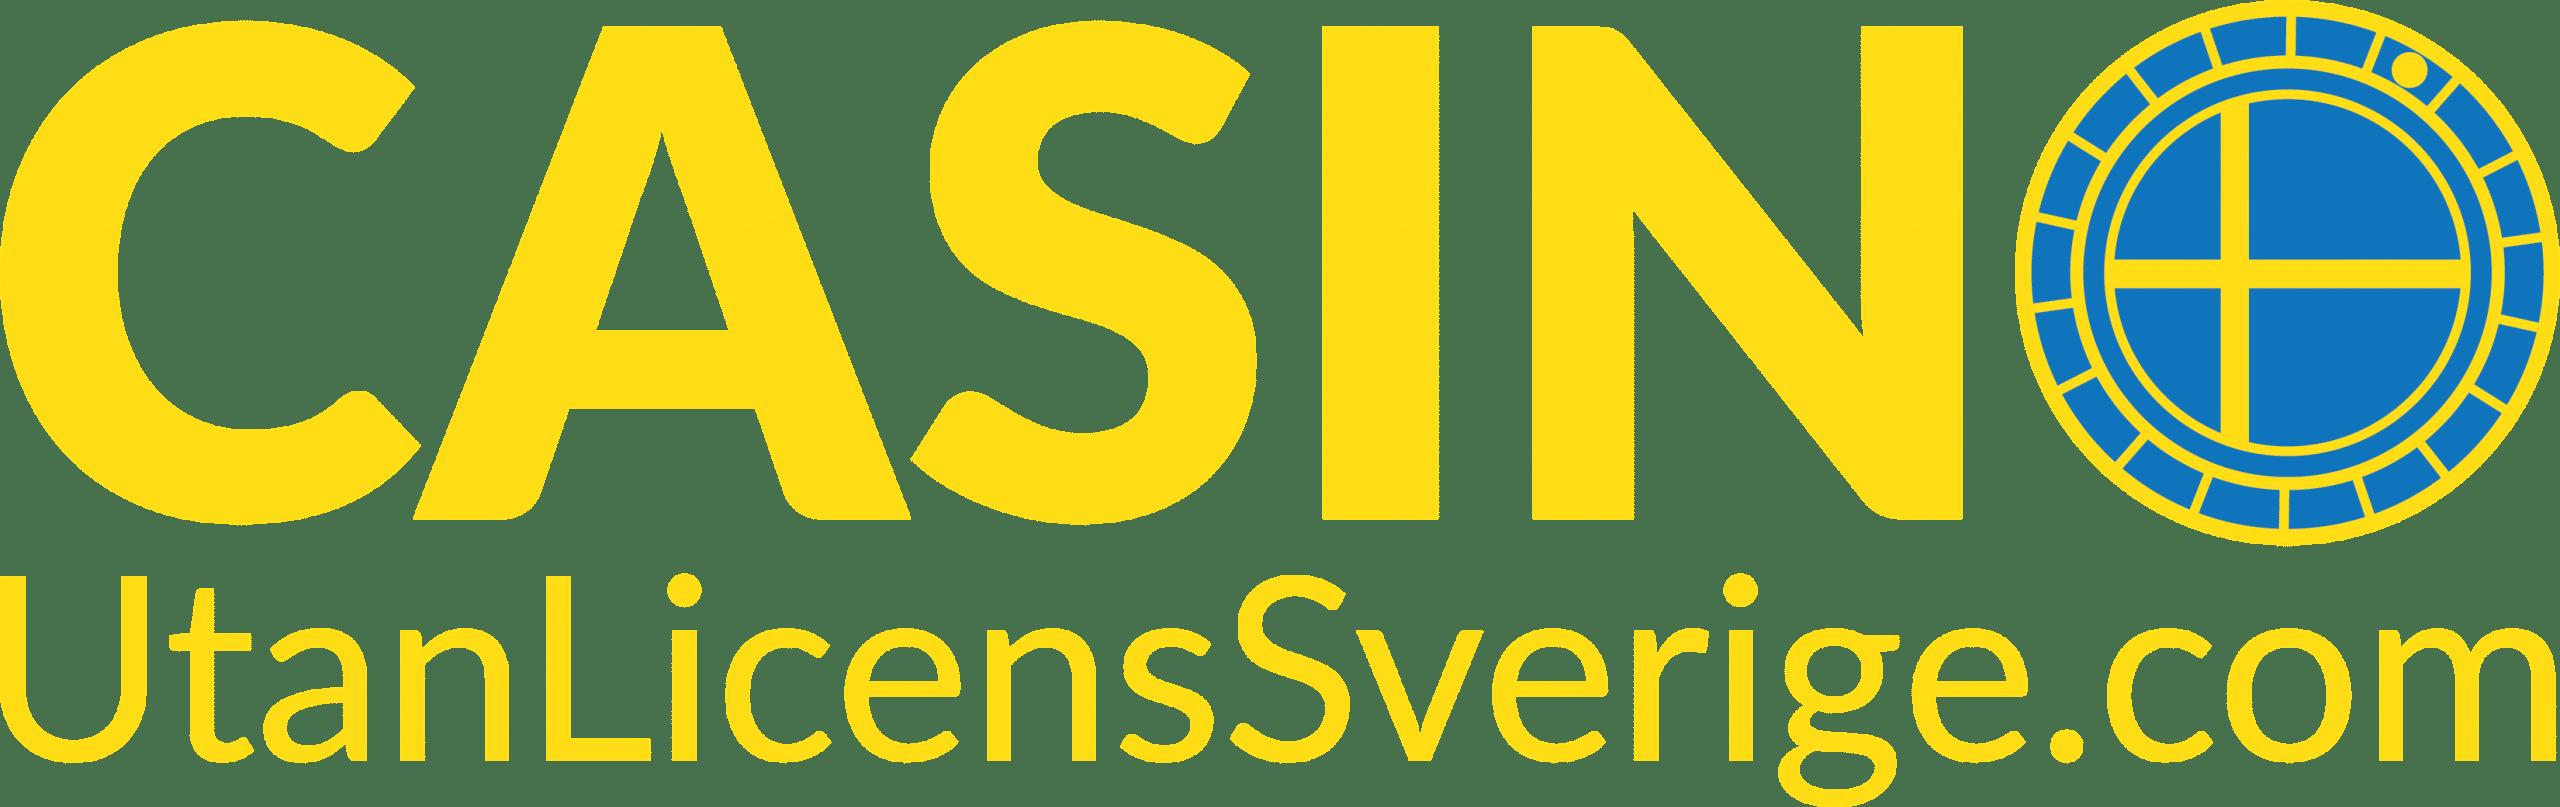 Casino utan licens Sverige logga